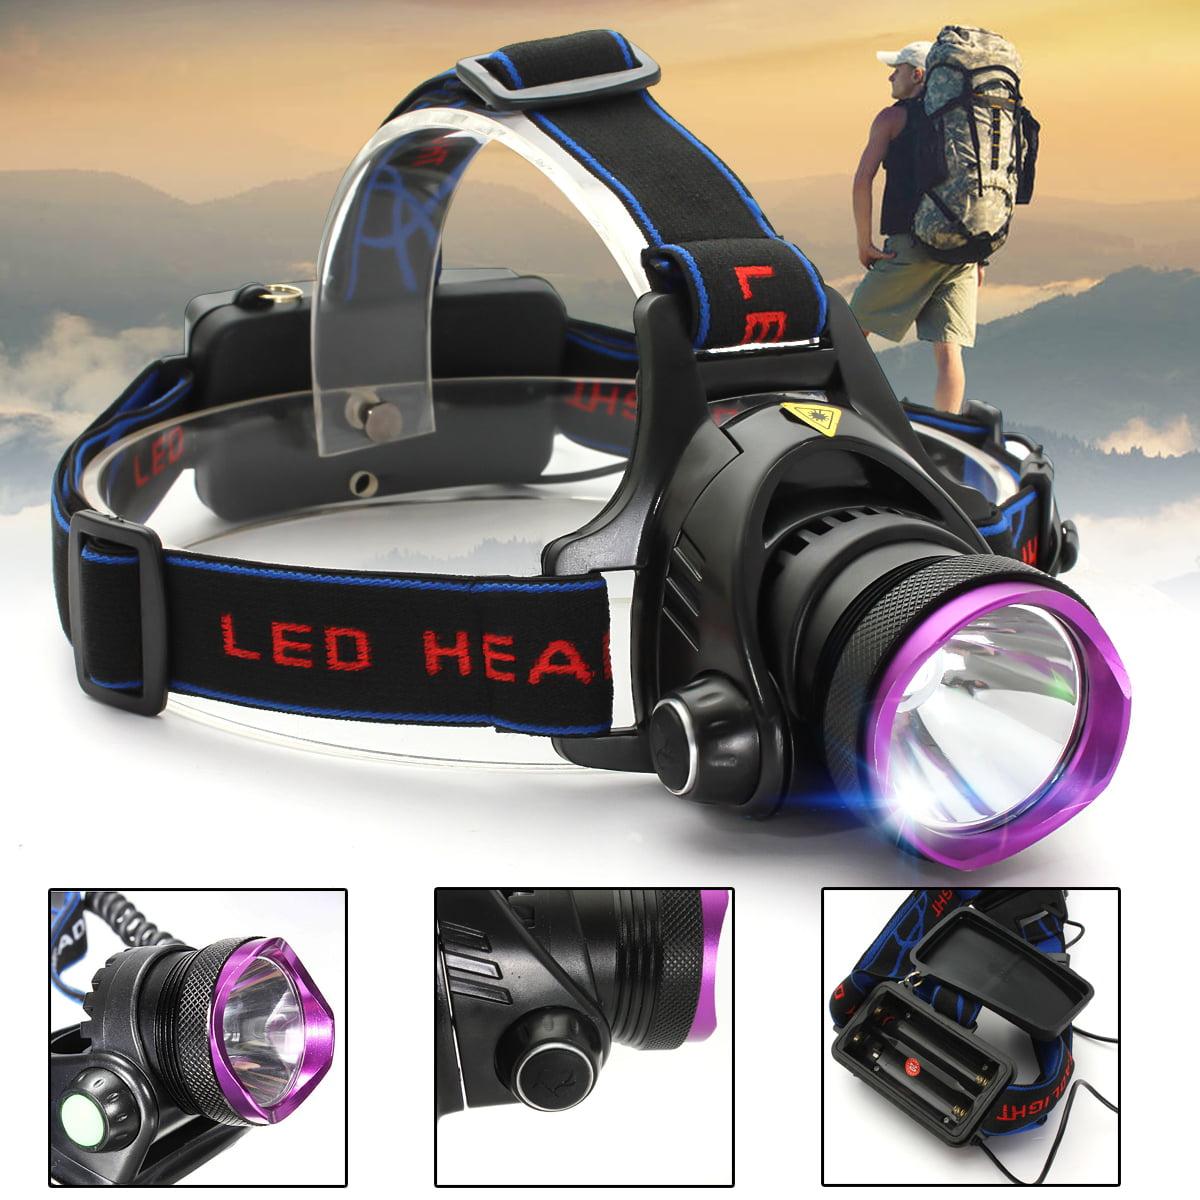 2000 Lumen T6 LED Rechargeable Headlamp Headlight Flashlight Lantern 3 Modes for Camping Biking Hunting Fishing